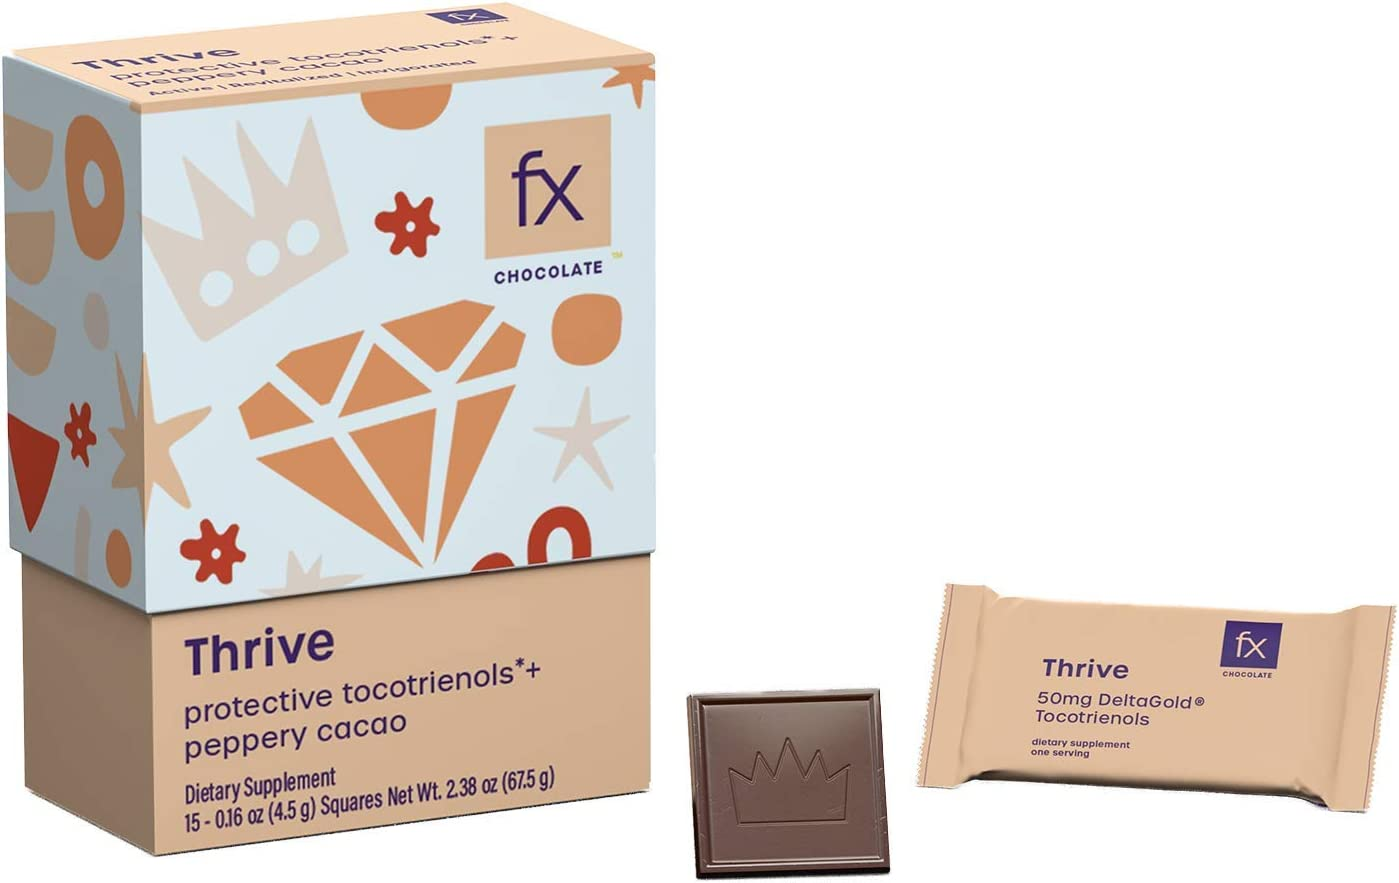 Fx Chocolate Thrive - Keto Special price E Dark Today's only Vitamin Sugar-Free